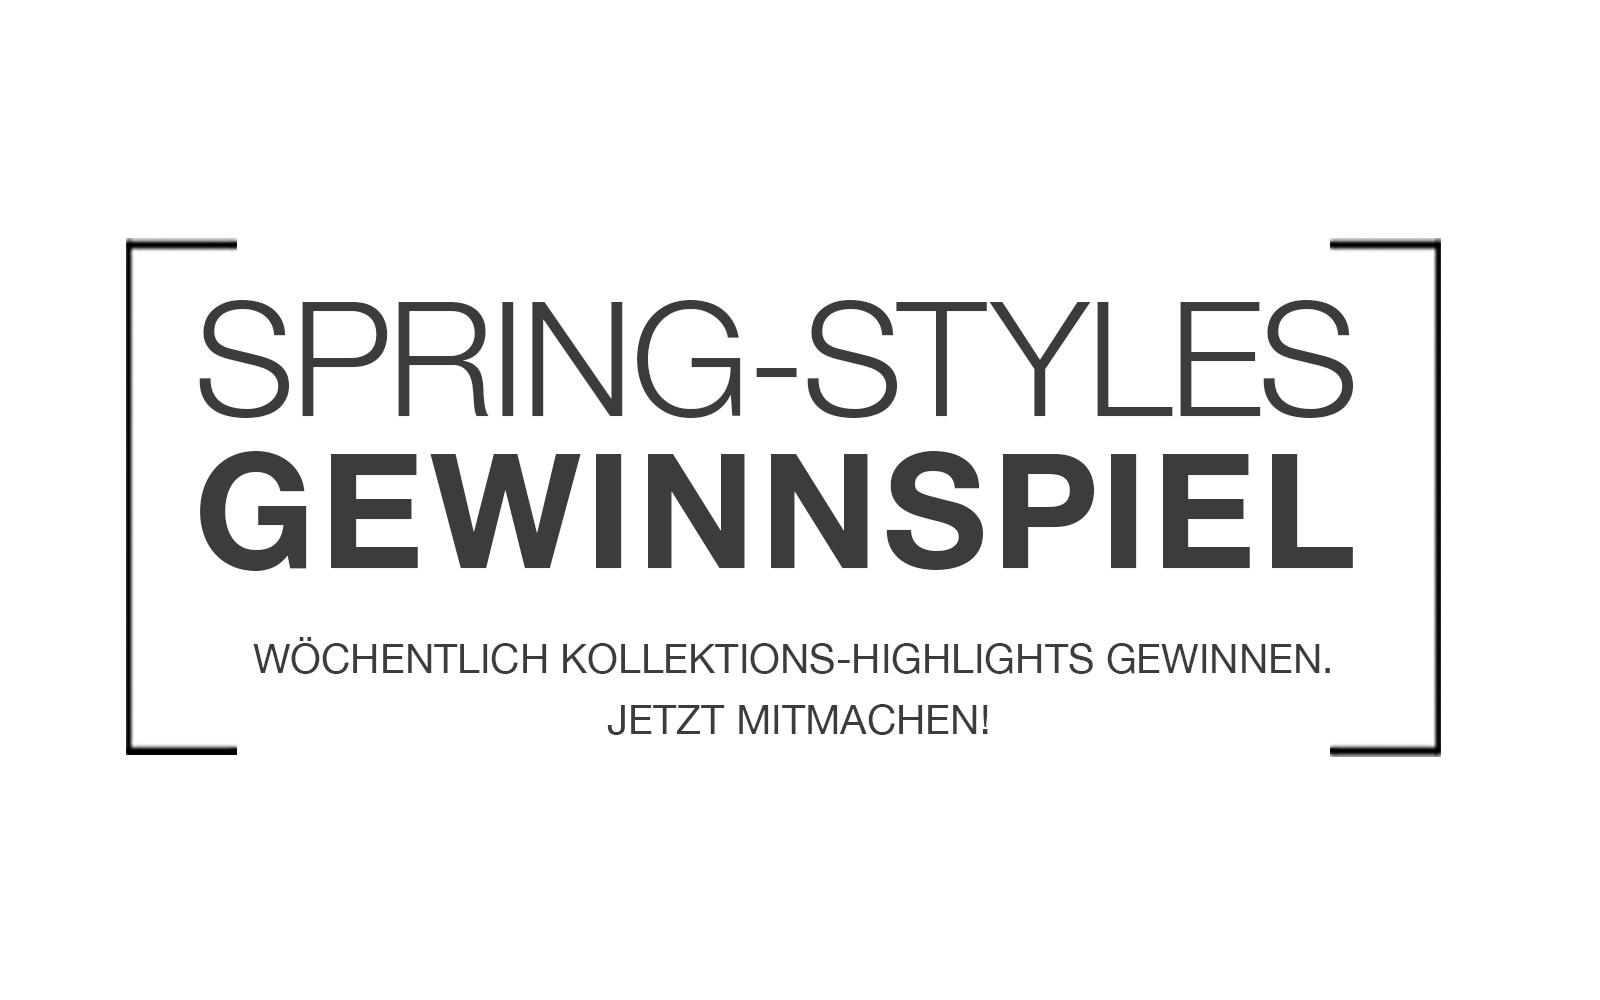 Gewinnspiel Spring Styles